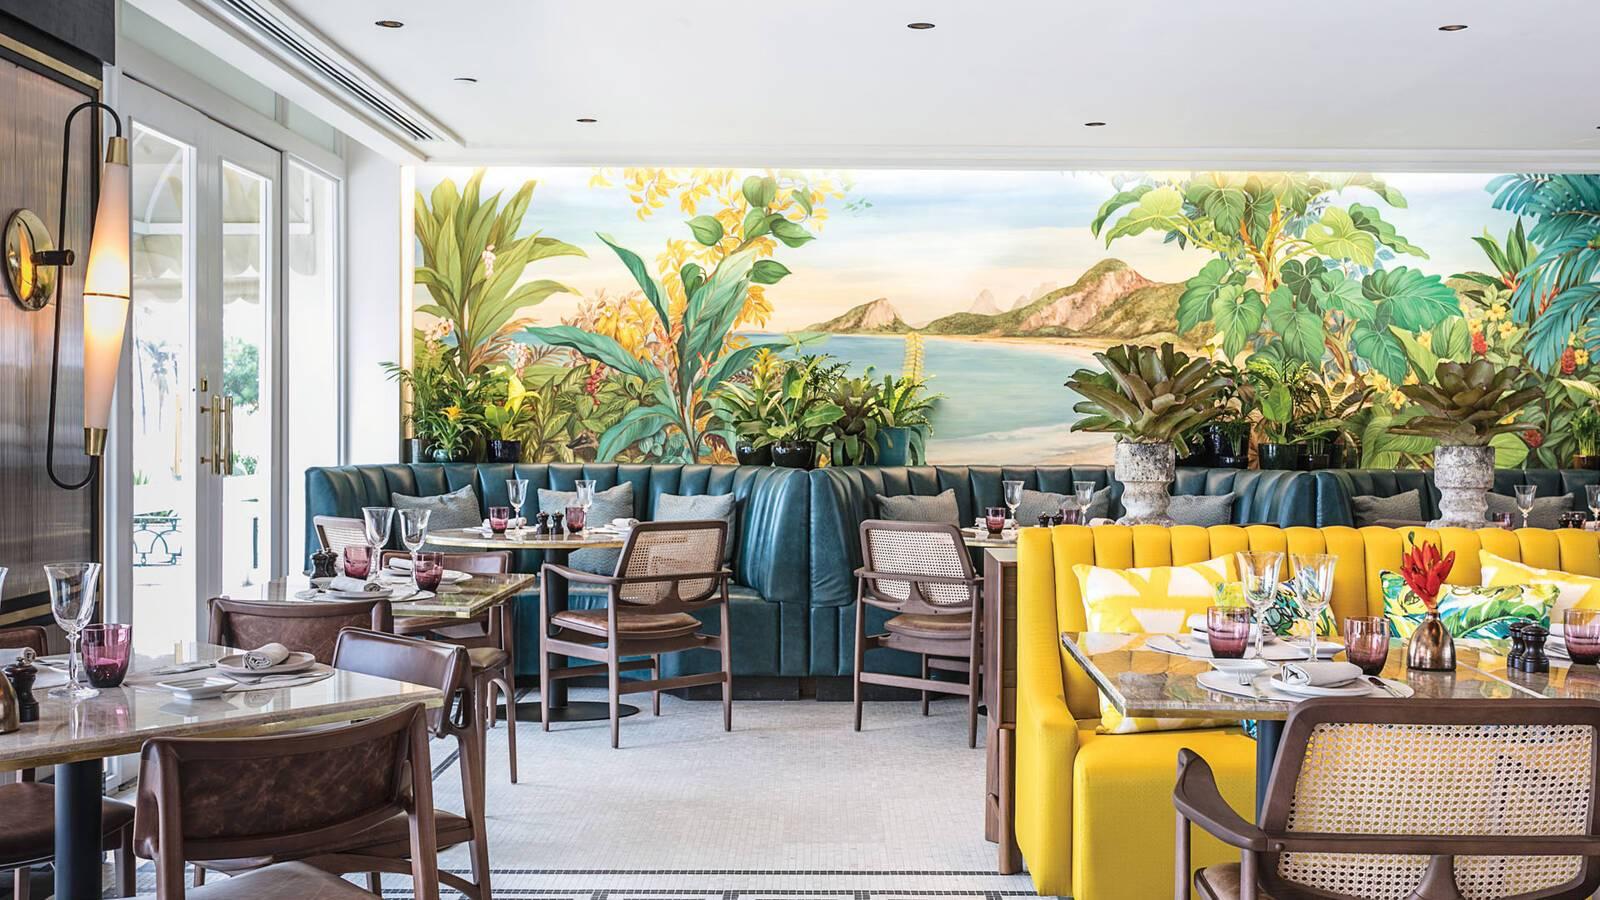 Bresil Belmond Copacabana Palace Restaurant